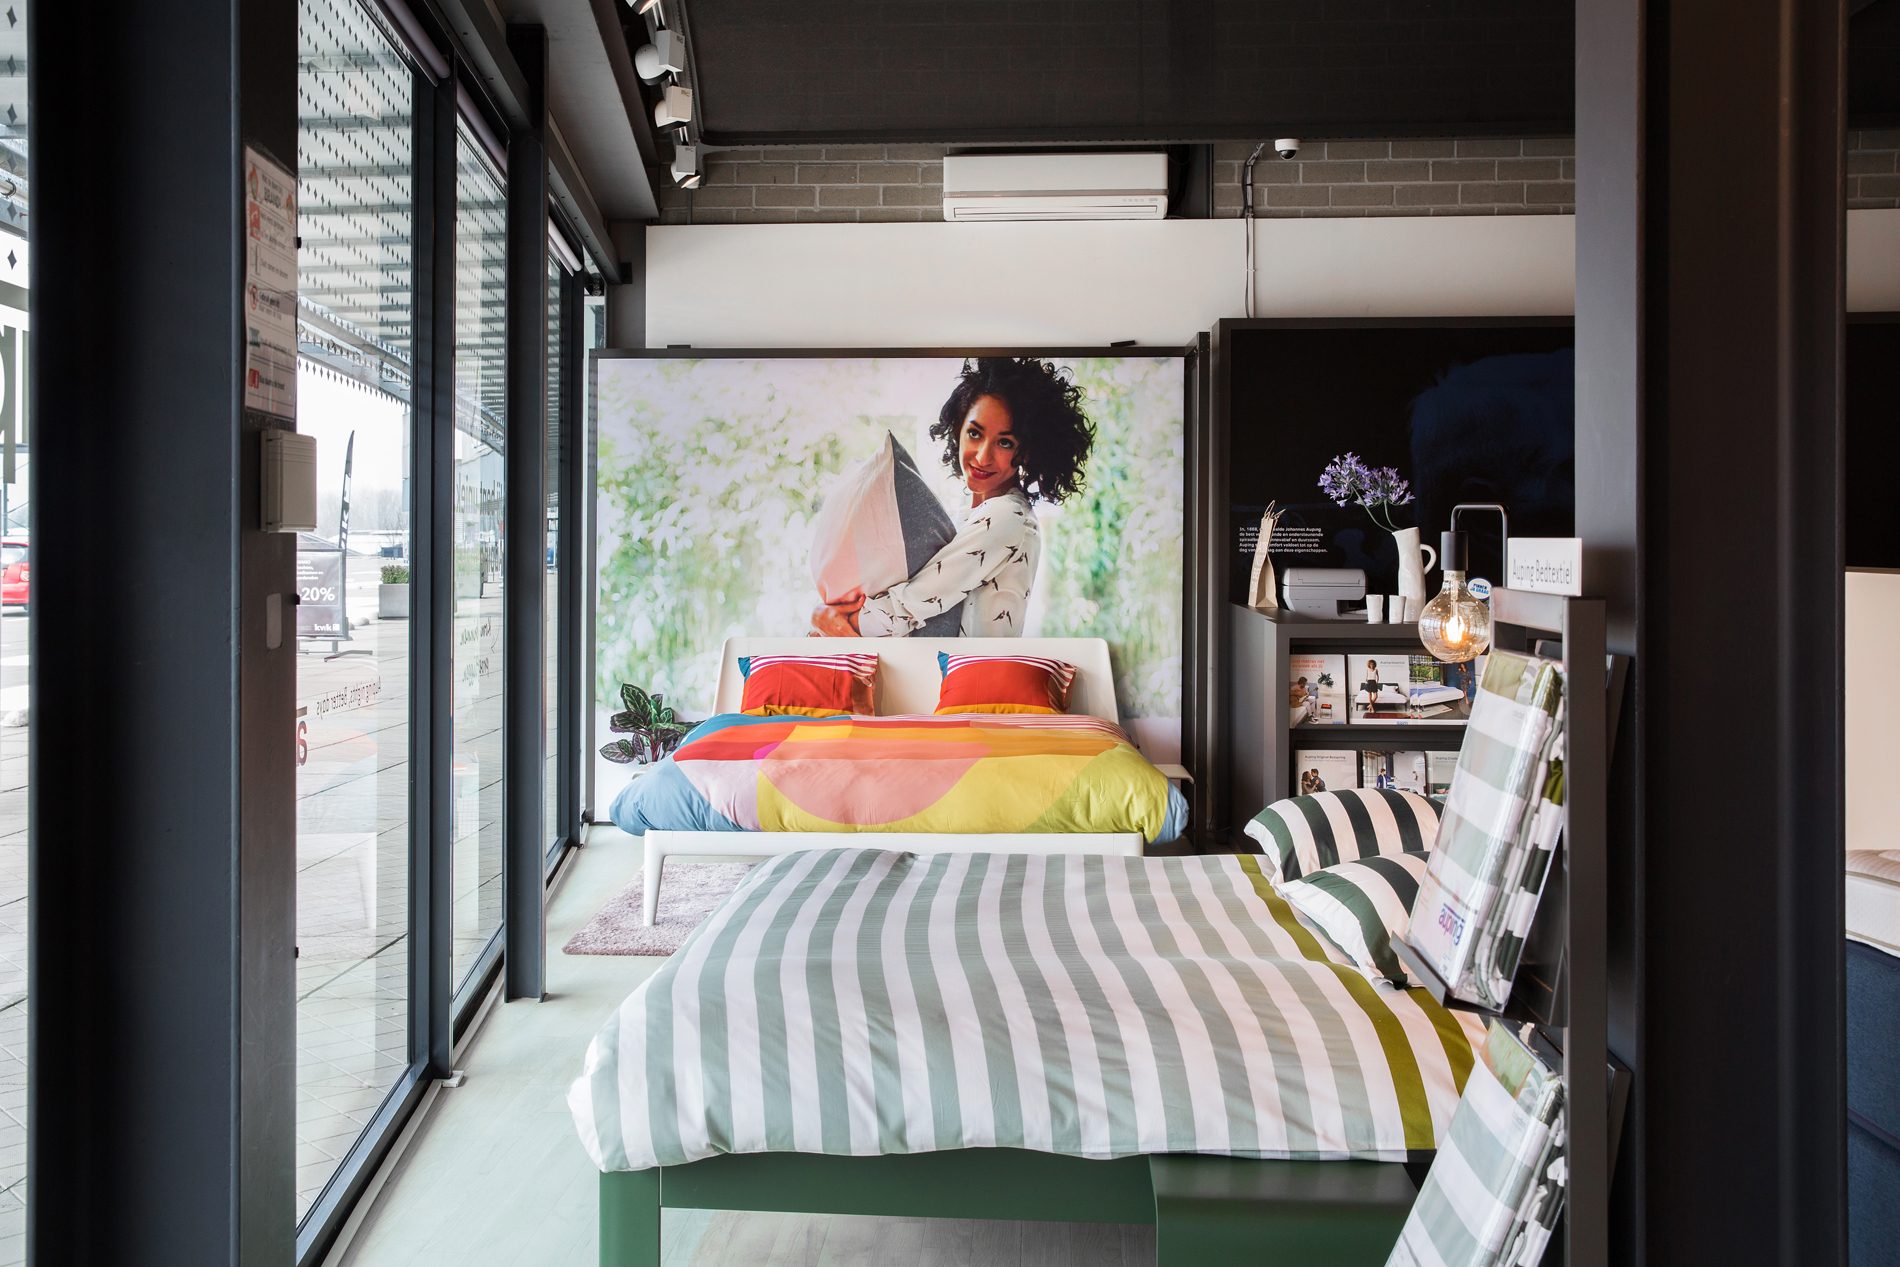 Auping Plaza Heerlen – Natural Vita Talalay Latex Mattress Store in Heerlen Limburg